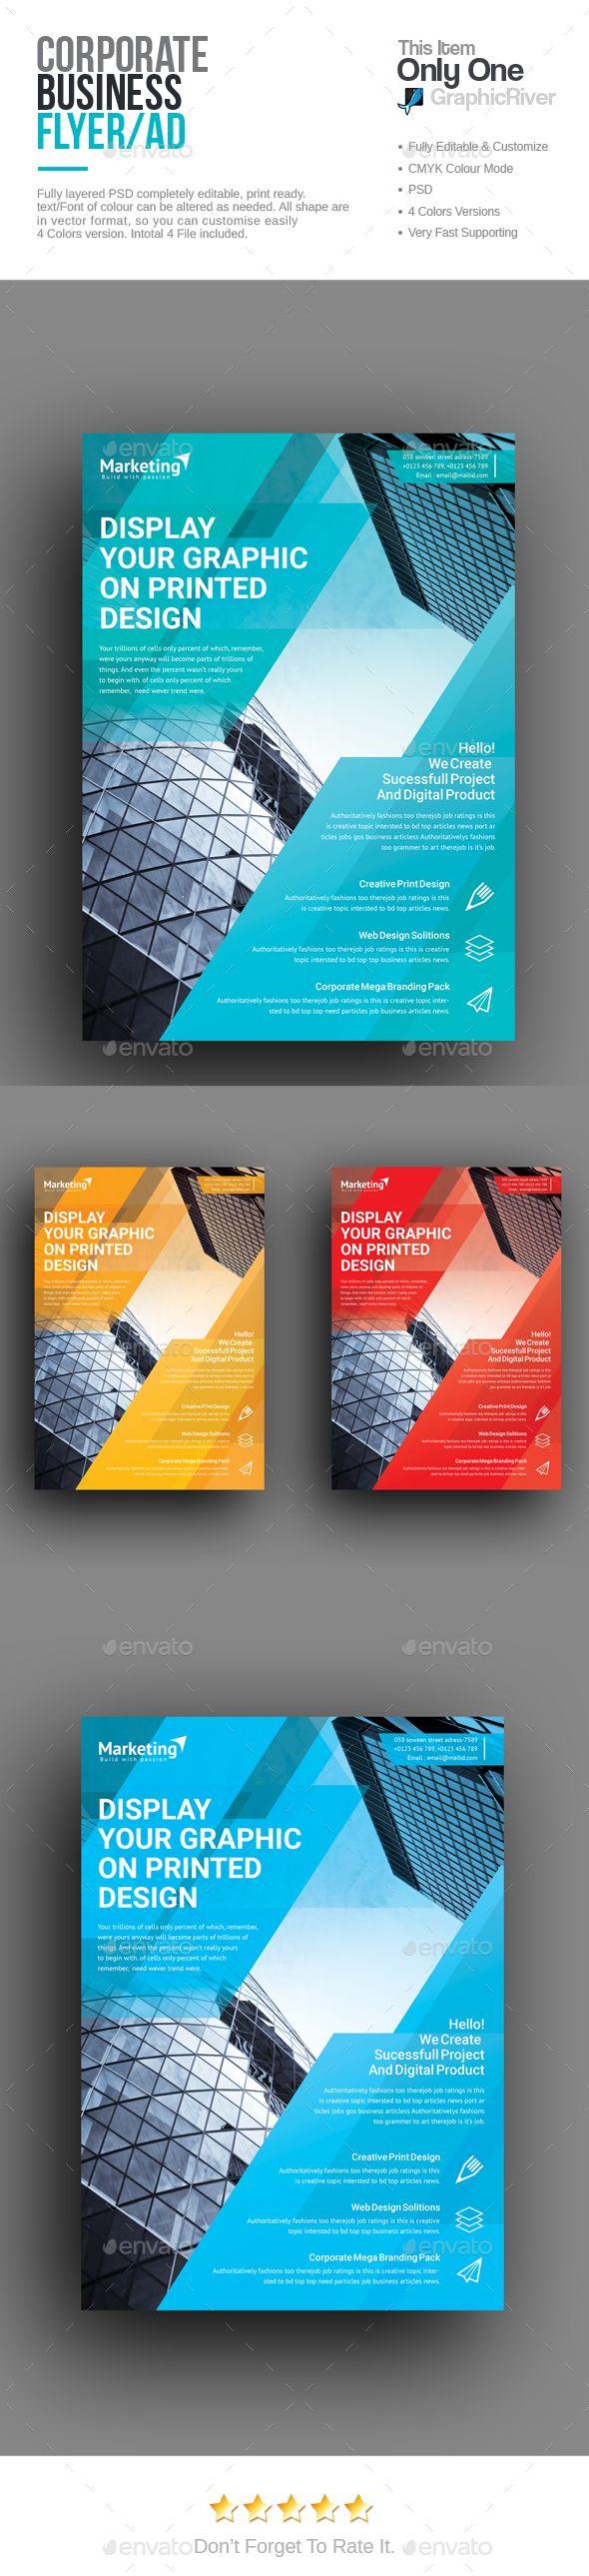 Poster design rates - Corporate Flyer Business Postercreative Flyersflyer Designflyer